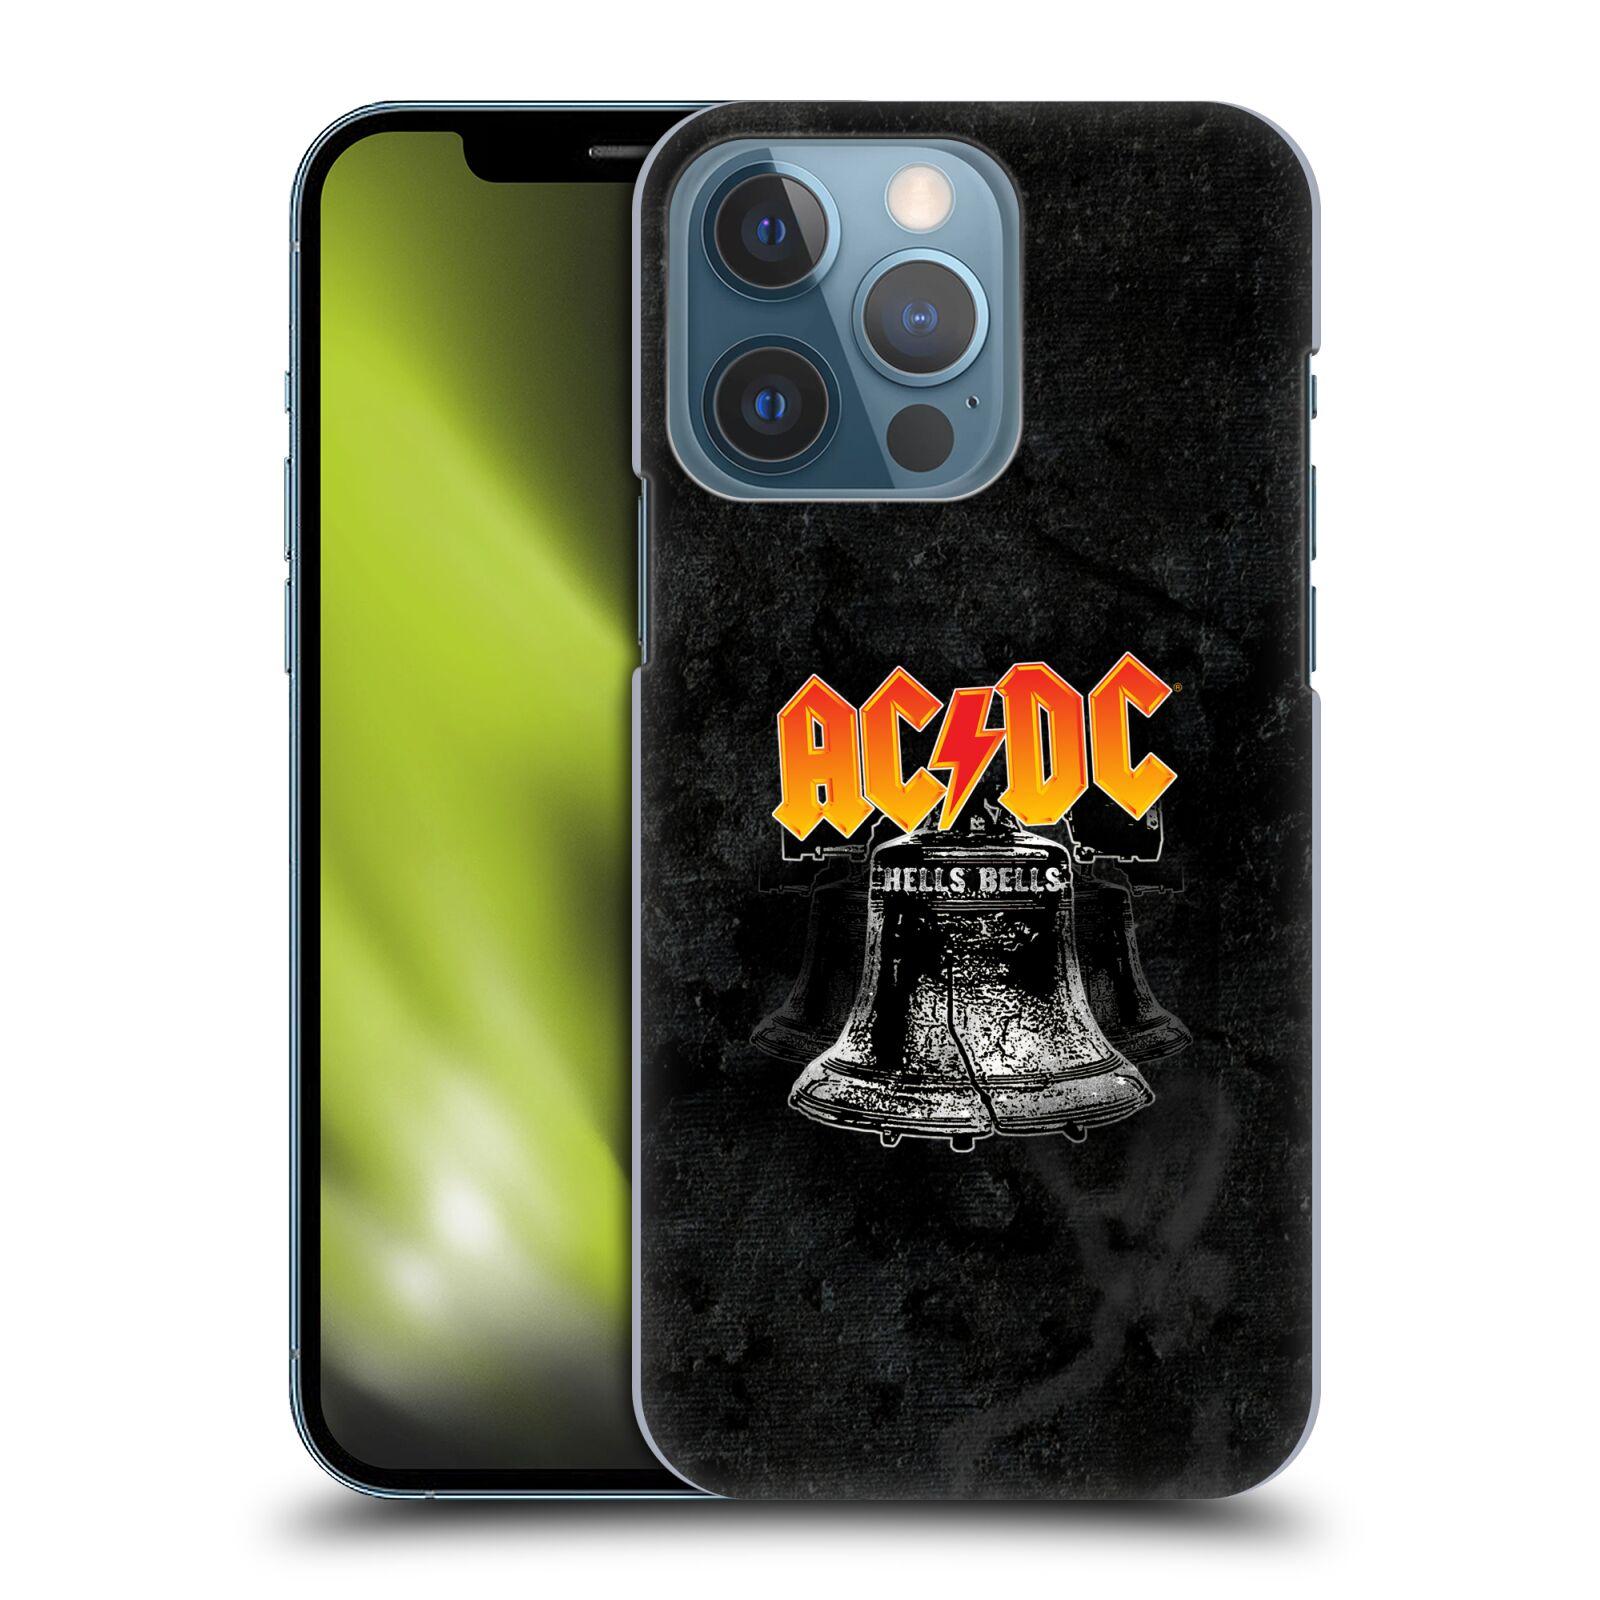 Plastové pouzdro na mobil Apple iPhone 13 Pro - Head Case - AC/DC Hells Bells